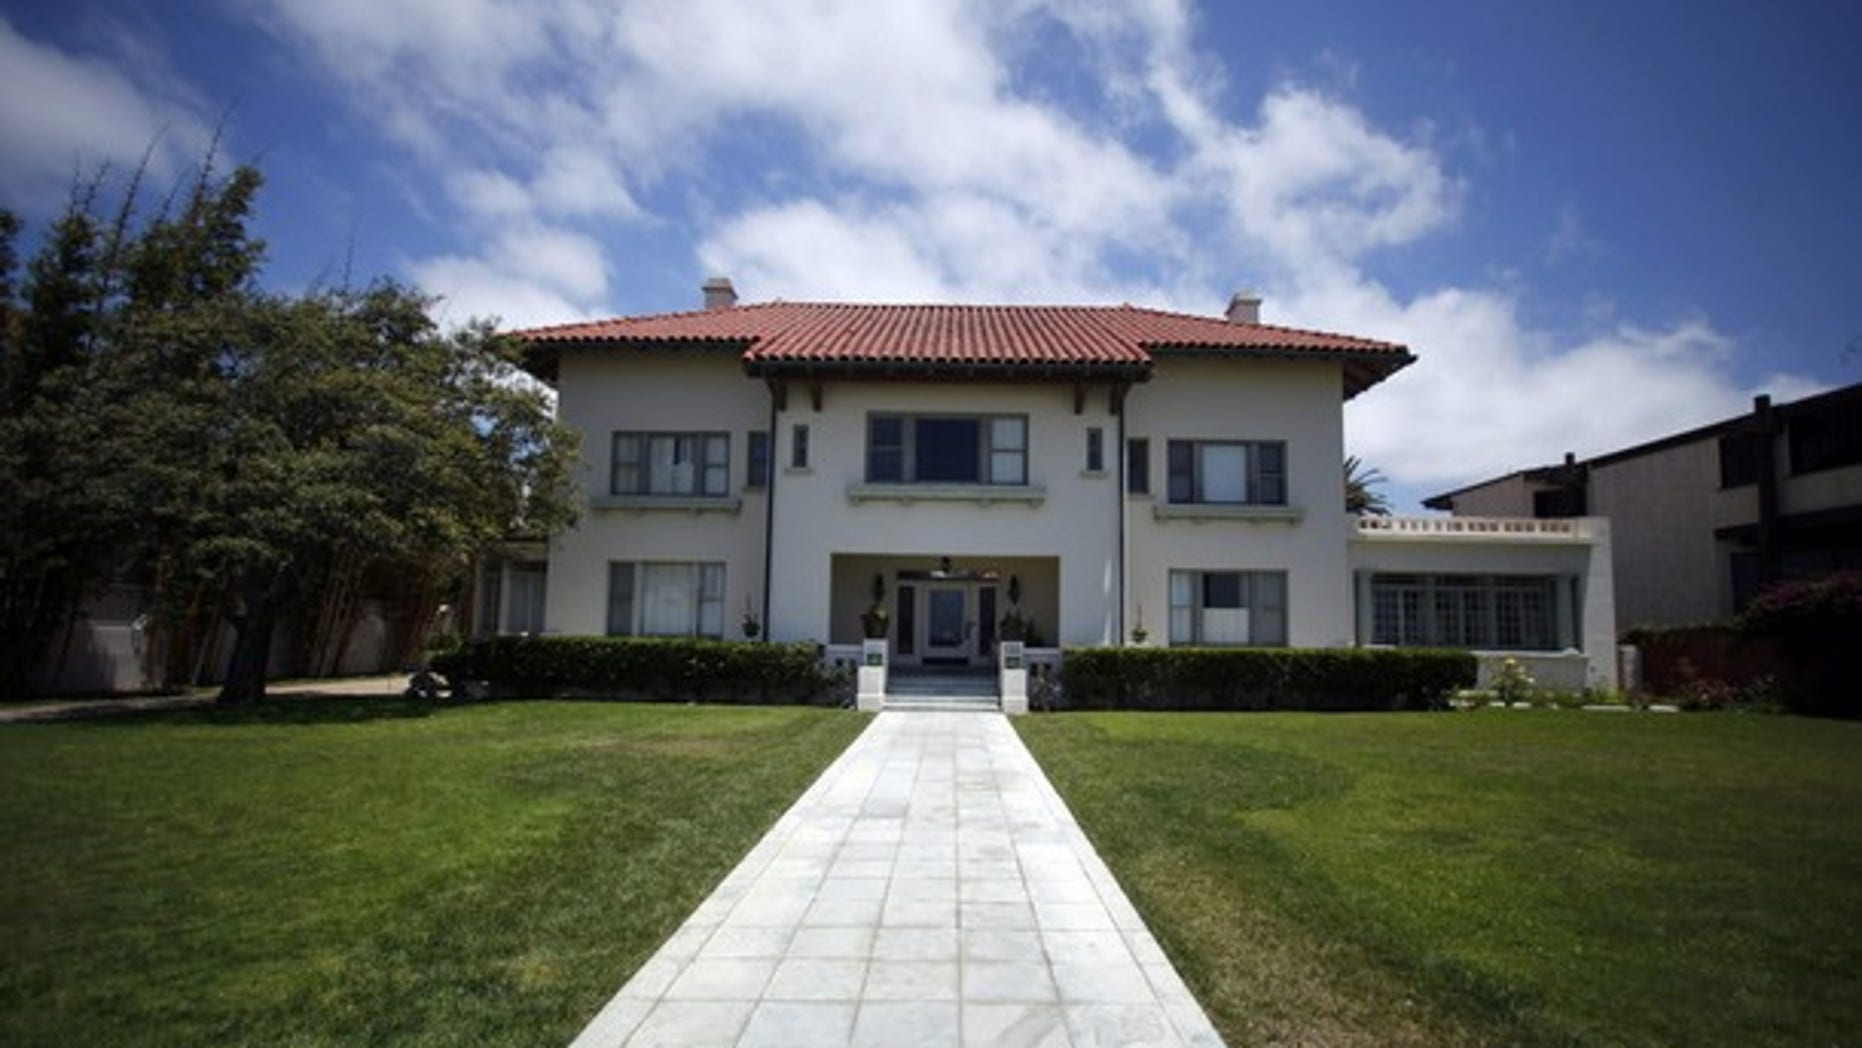 July 14: The Coronado home of Medicis Pharmaceutical Corp chief executive Jonah Shacknai (Reuters).